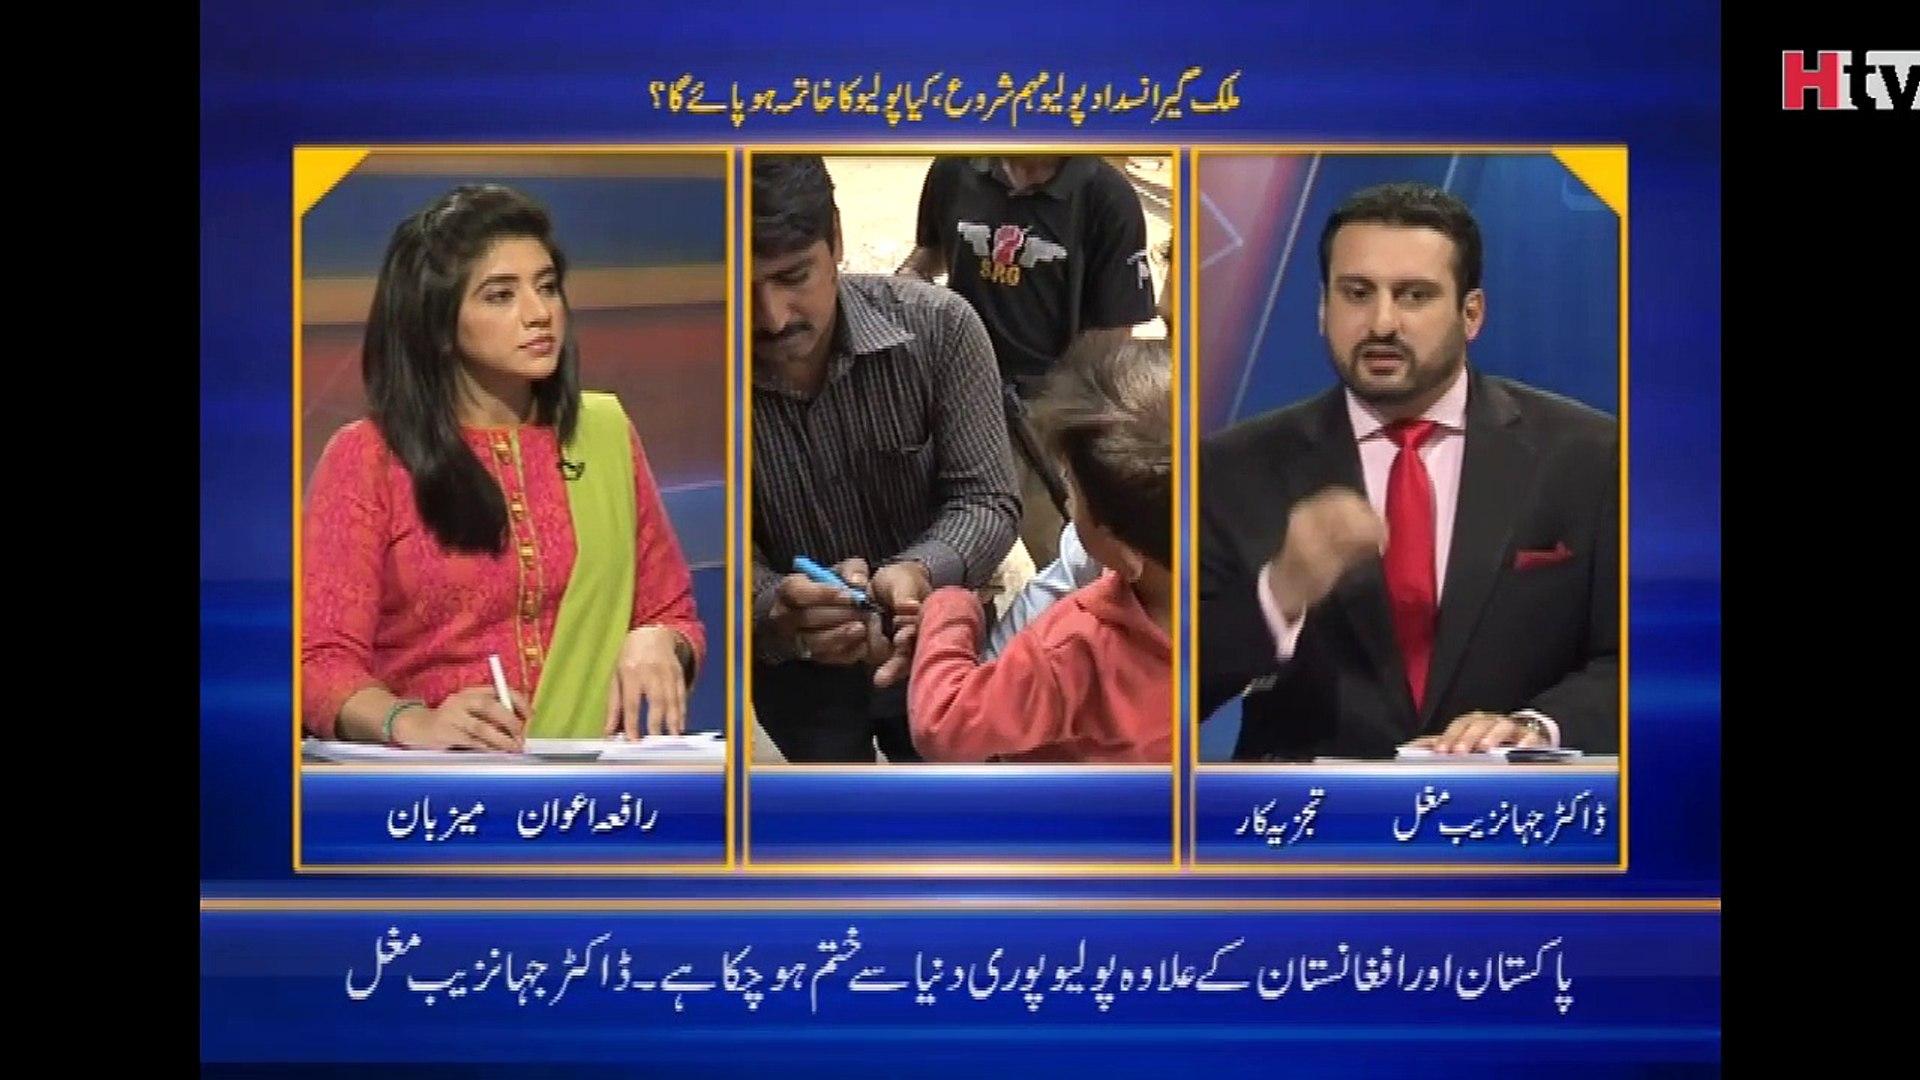 Sehat Agenda - Polio In Pakistan - HTV